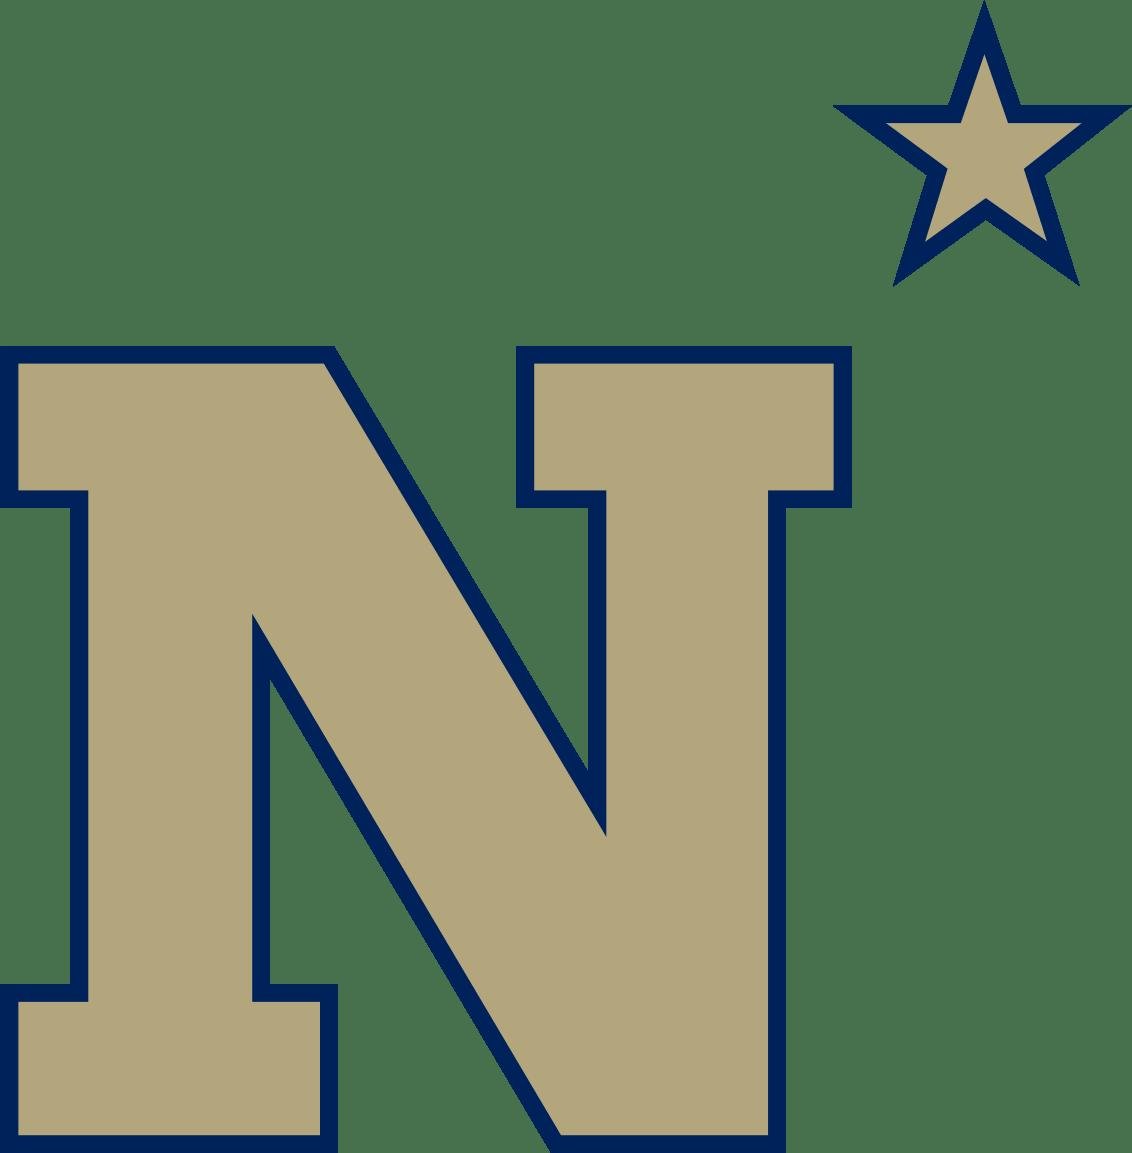 Navy Lacrosse Touchscreen Display